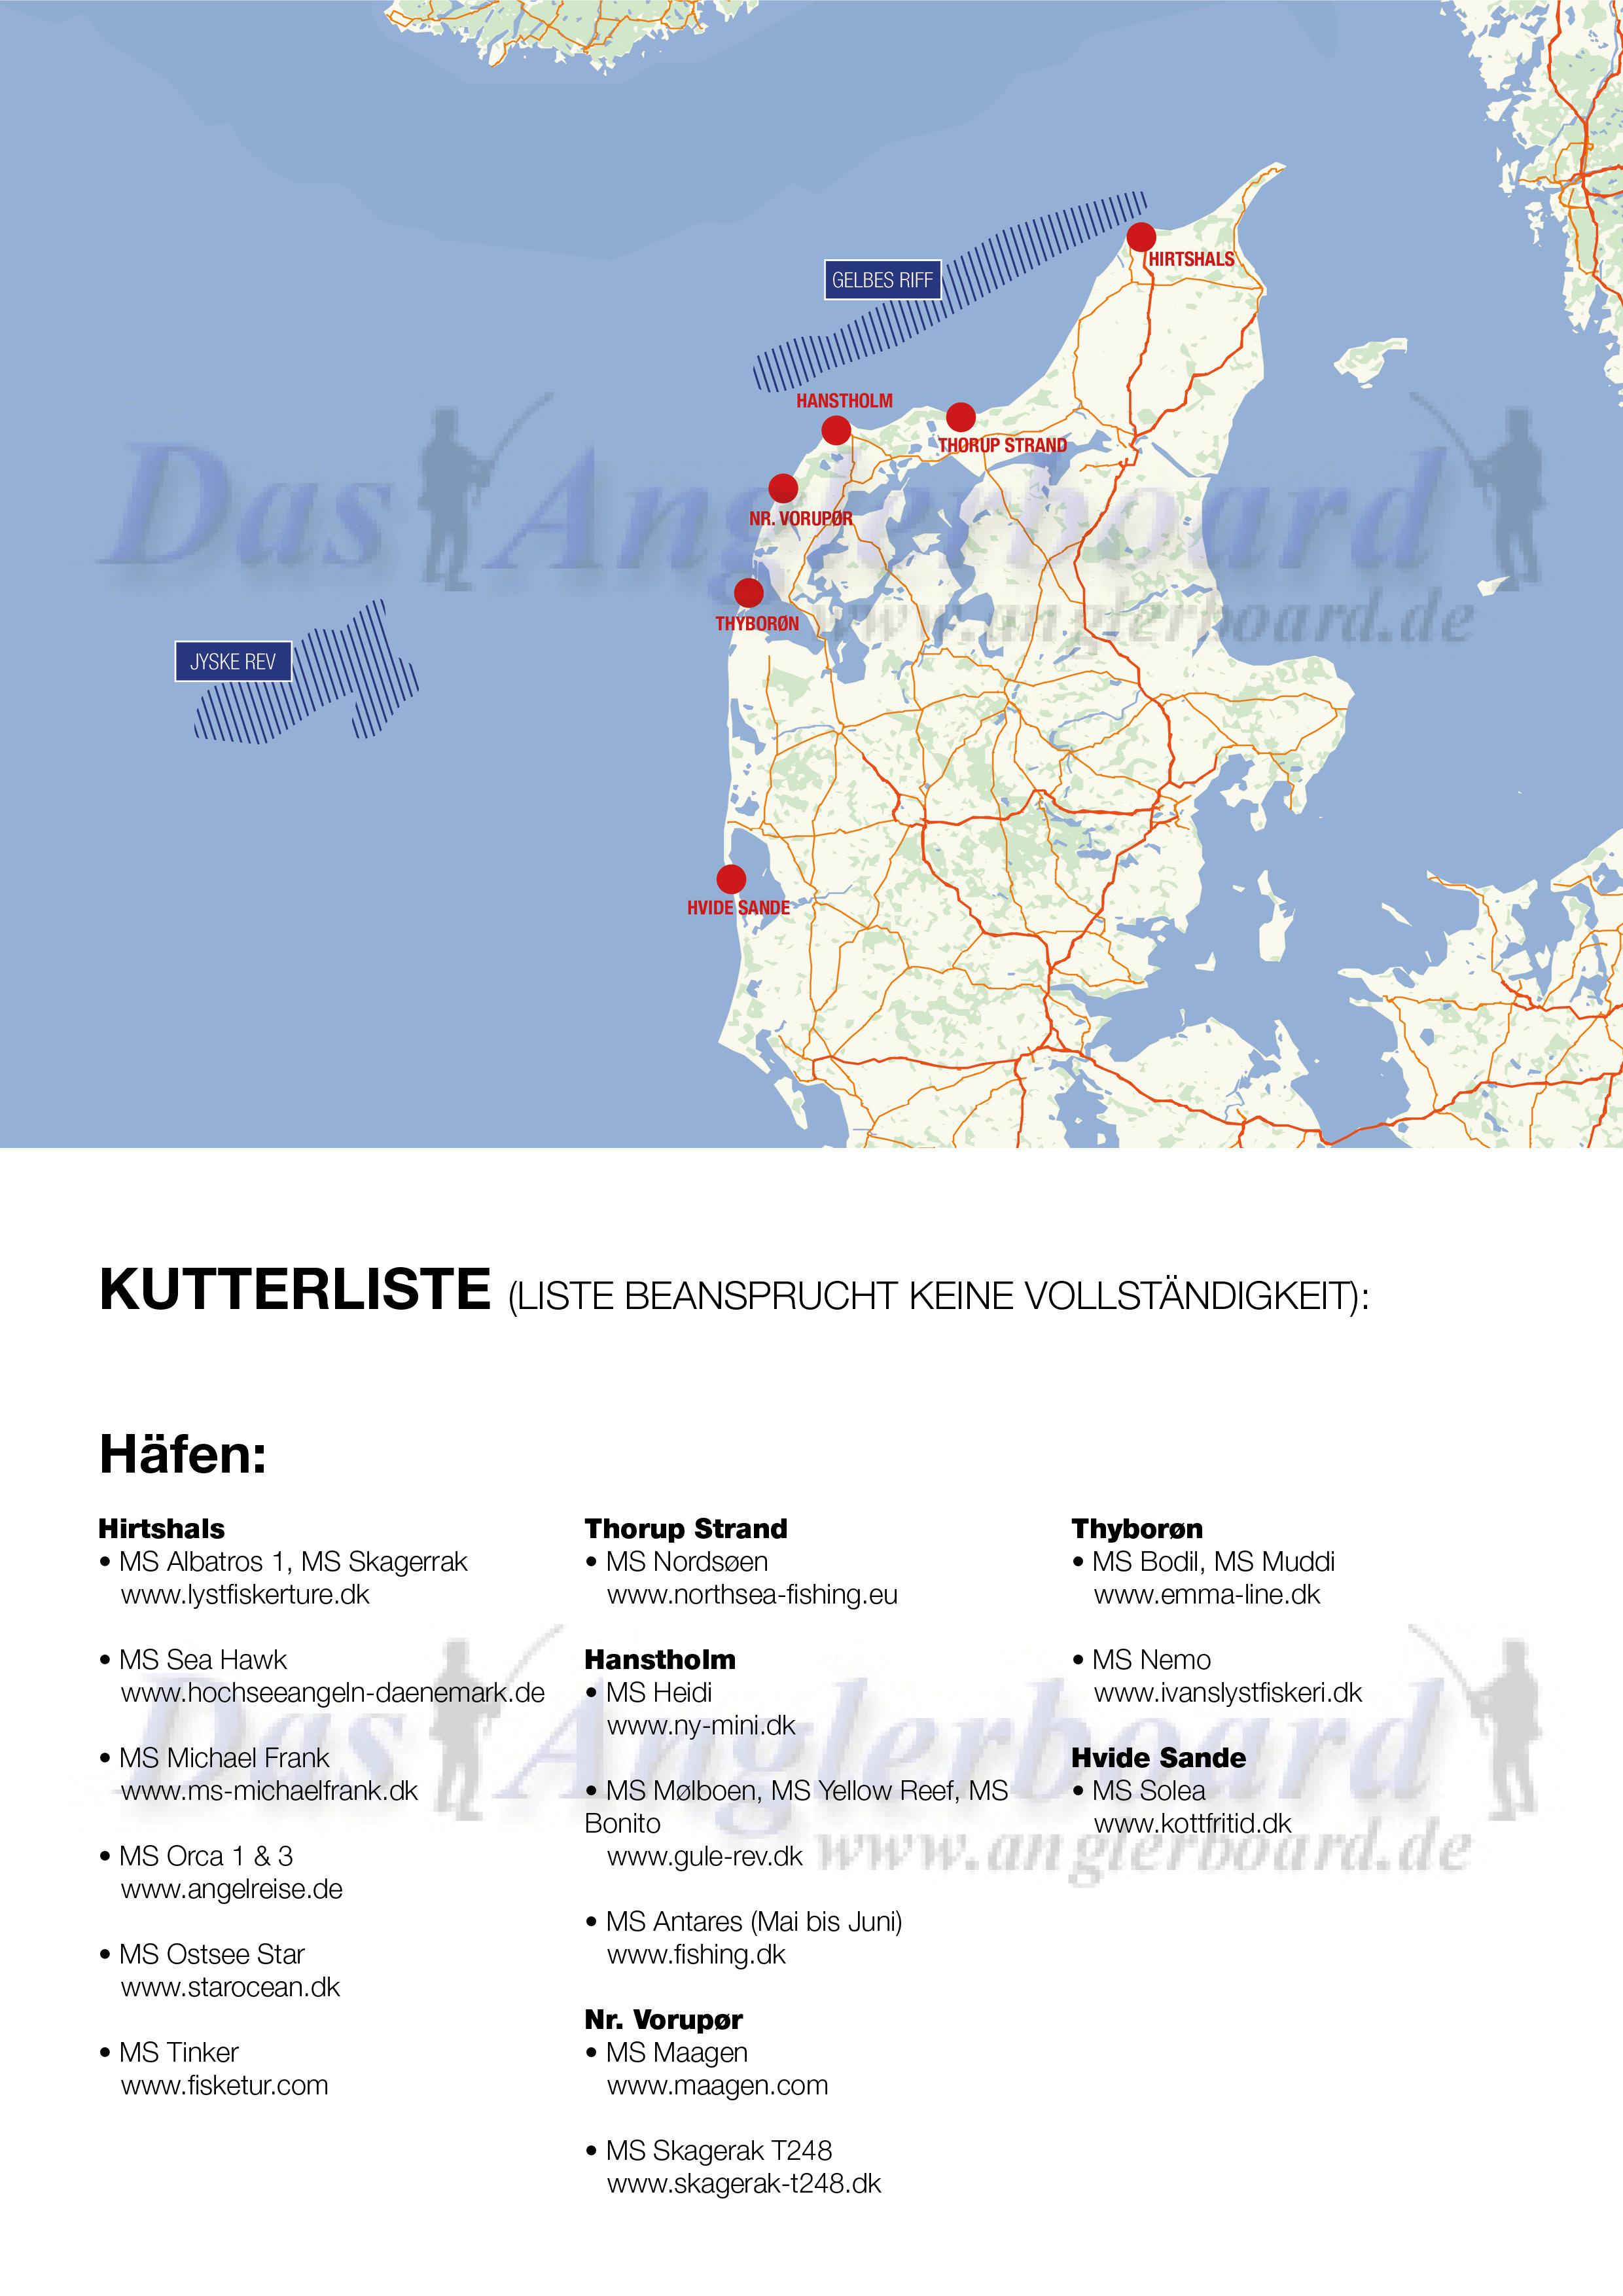 Anglerboard_KutterlisteKarte-1.jpg